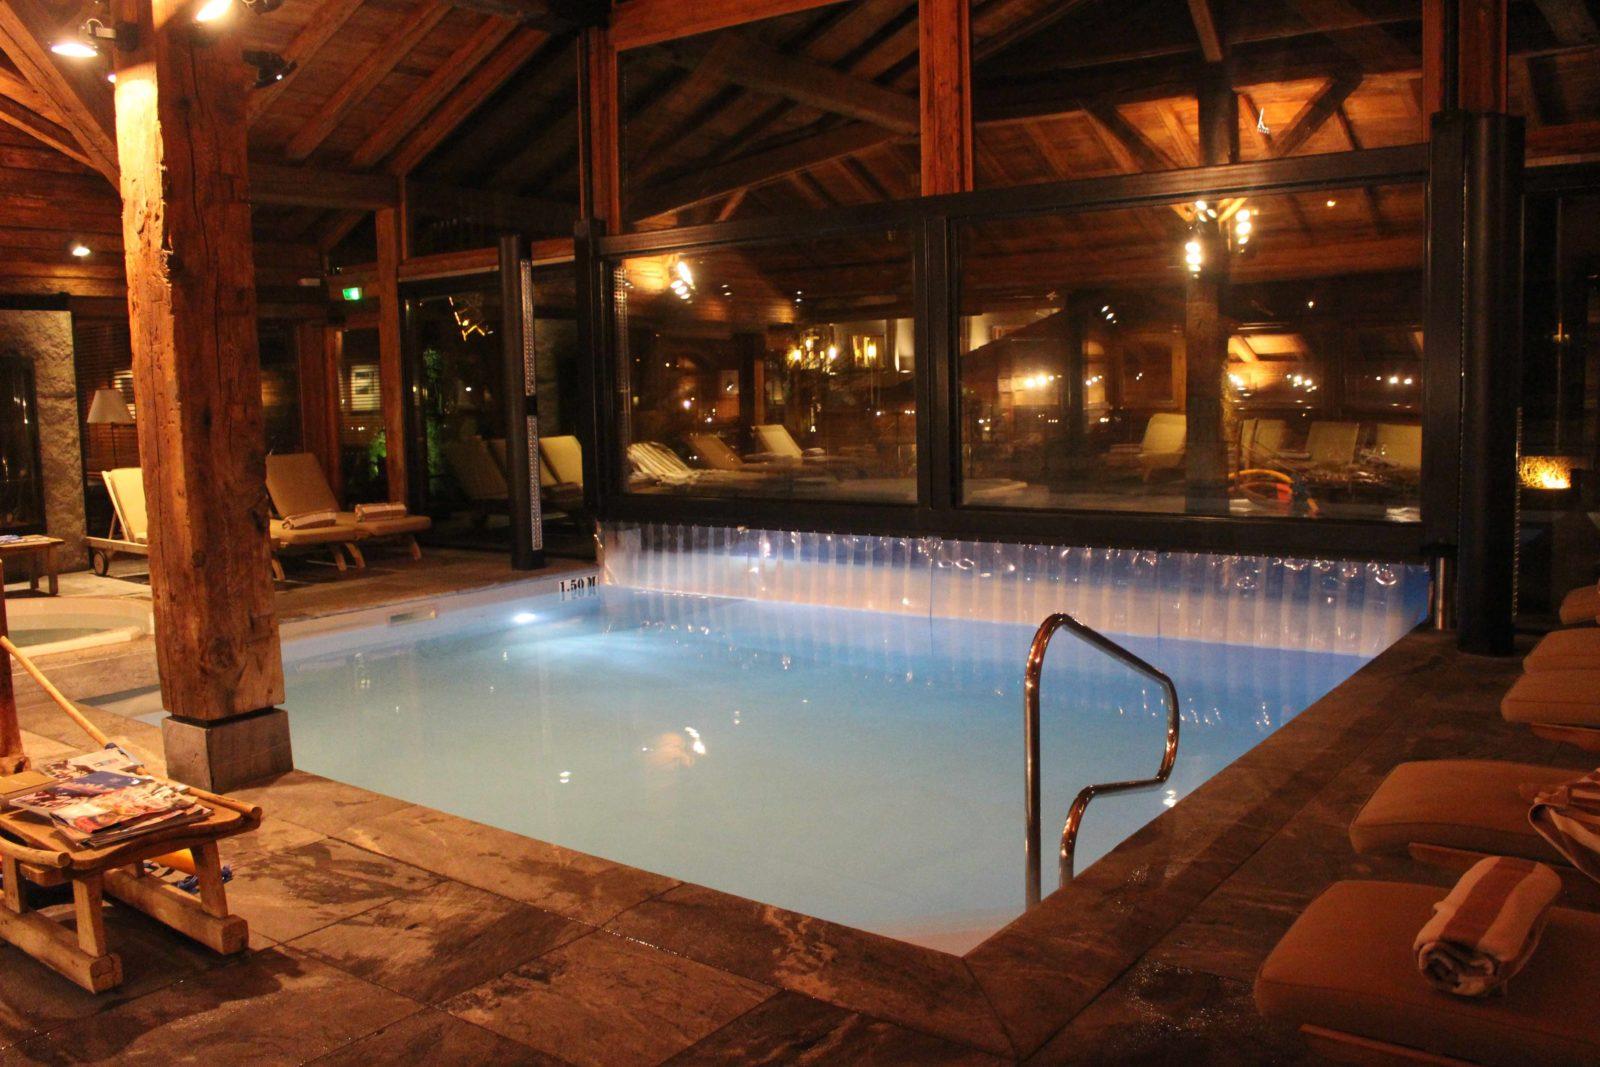 Chamonix Hameau Albert 1er piscine intérieure